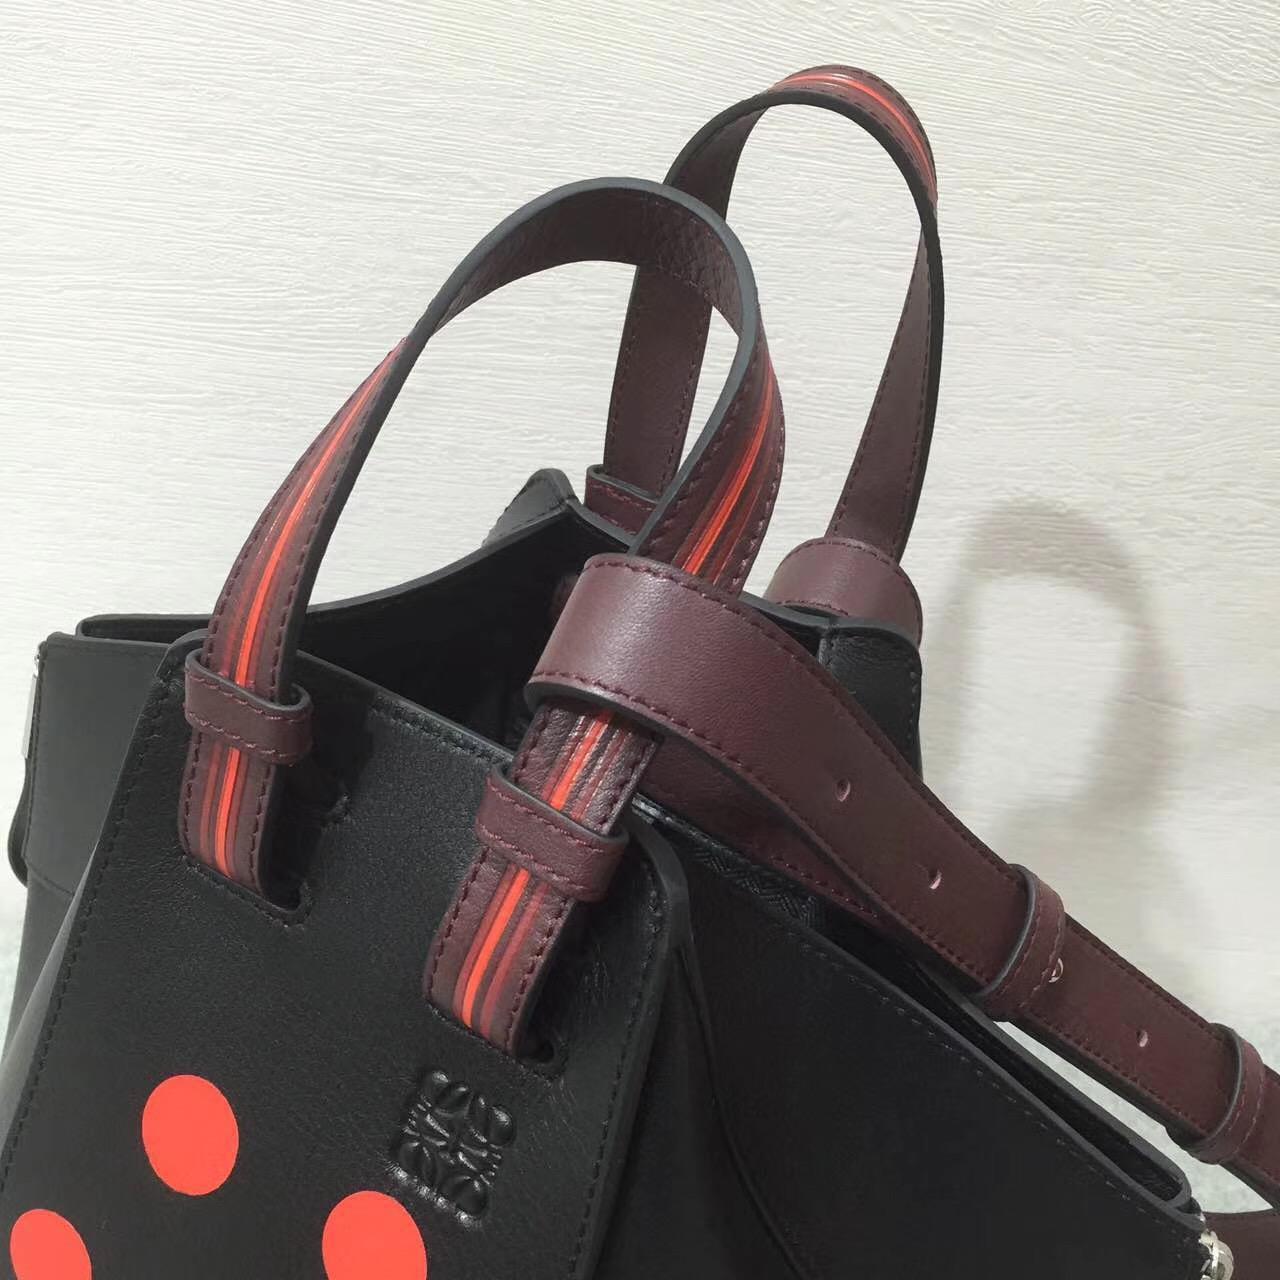 Loewe羅意威Hammock Circles Small Bag Black/Red/Oxblood